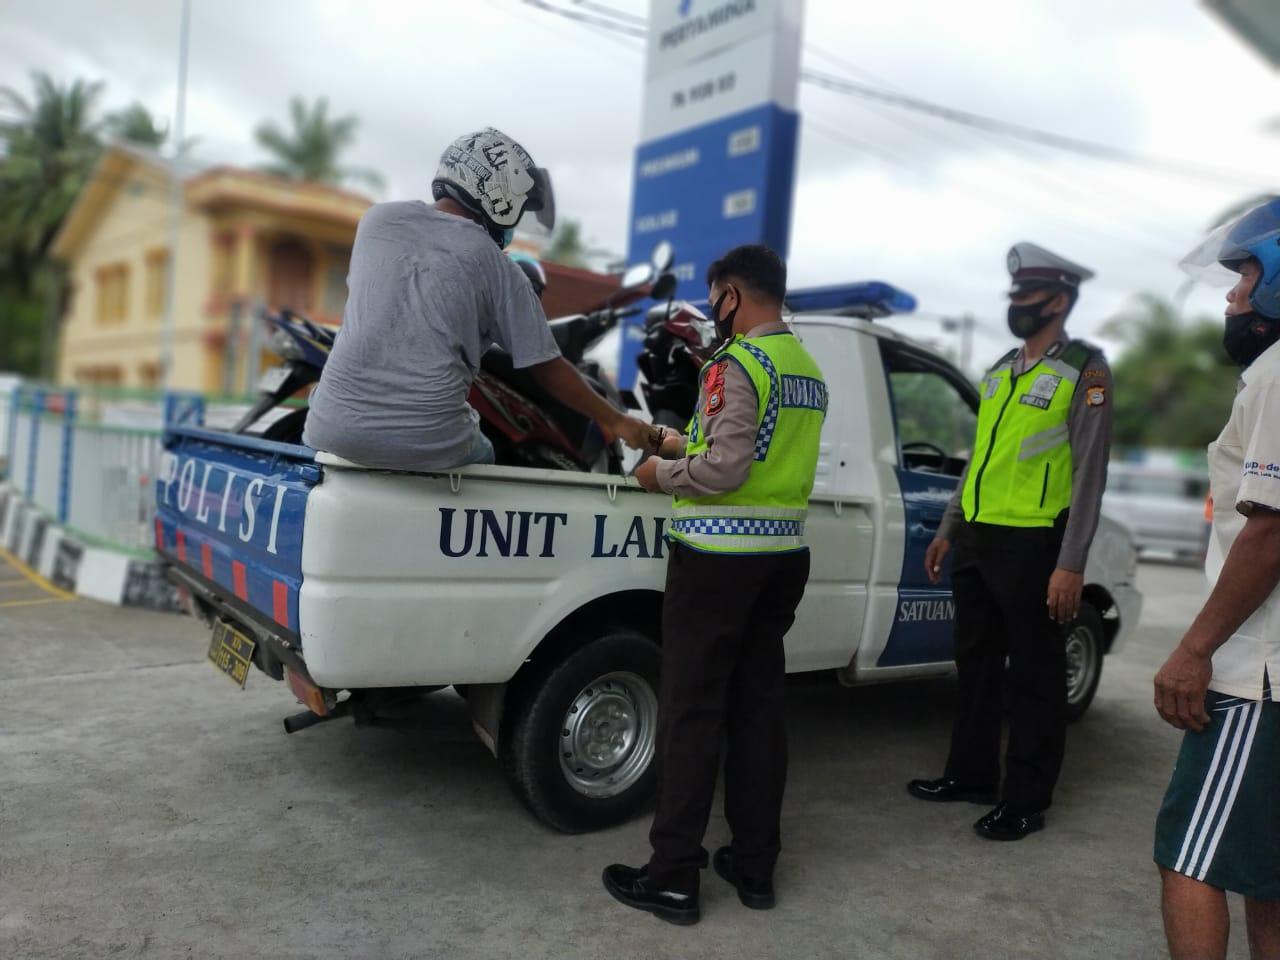 Sejumlah Motor Bertangki Besar Diamankan Polisi dari Lokasi APMS